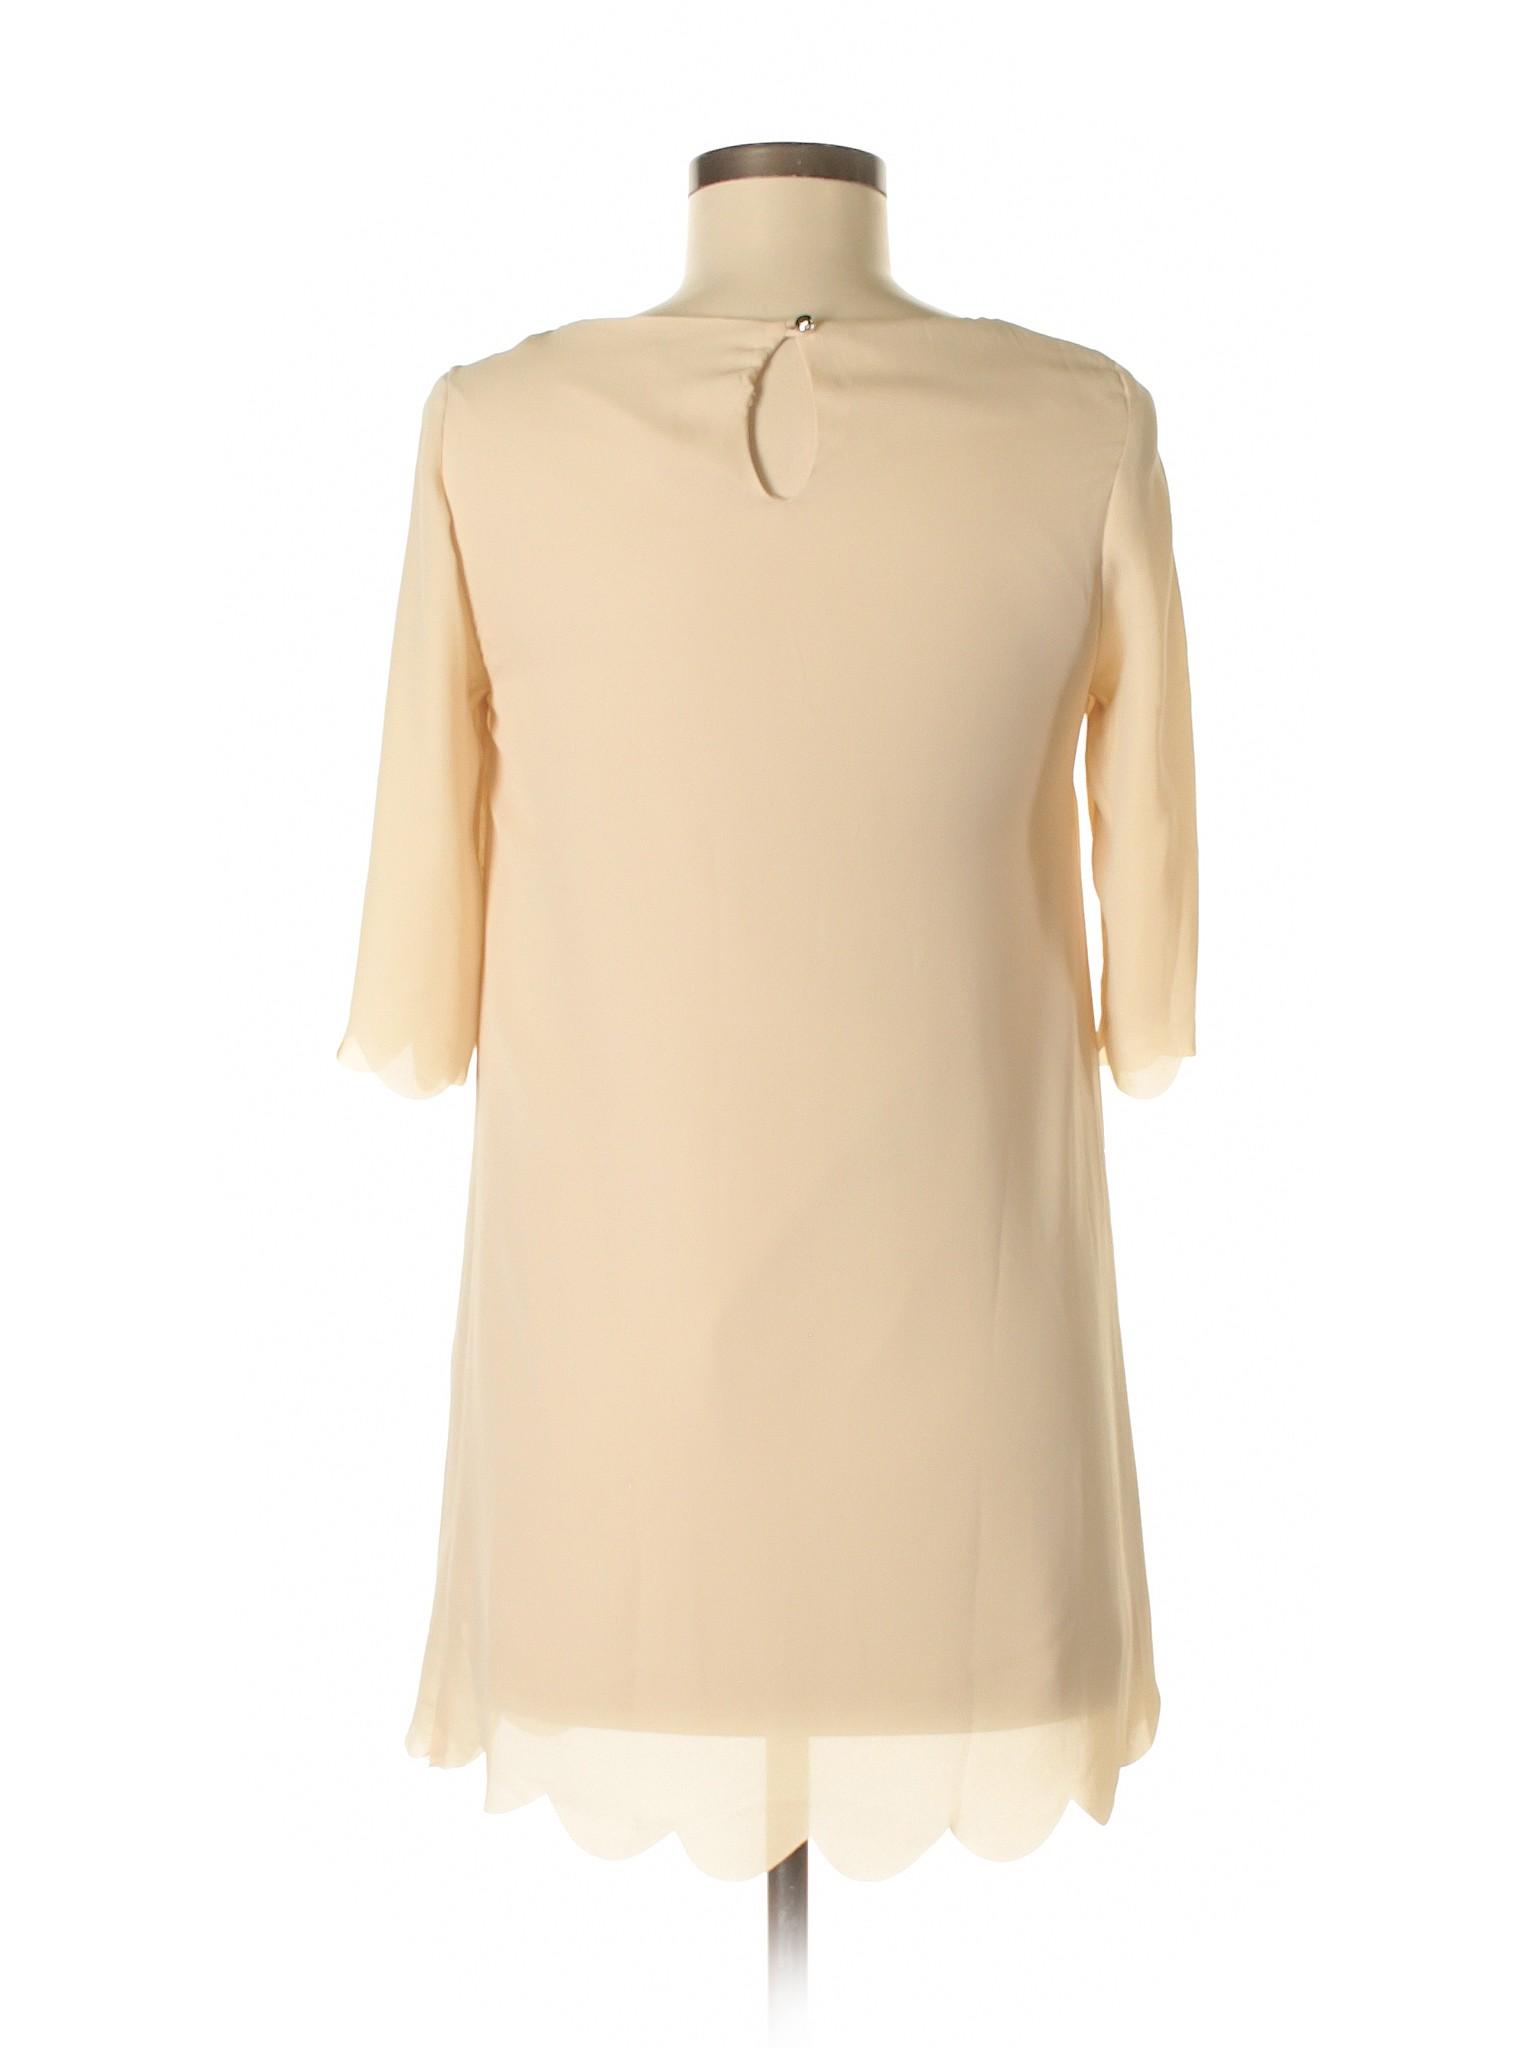 Dress Casual Dress Selling Casual Selling TOBI Selling TOBI TOBI Casual EEwqzxHr